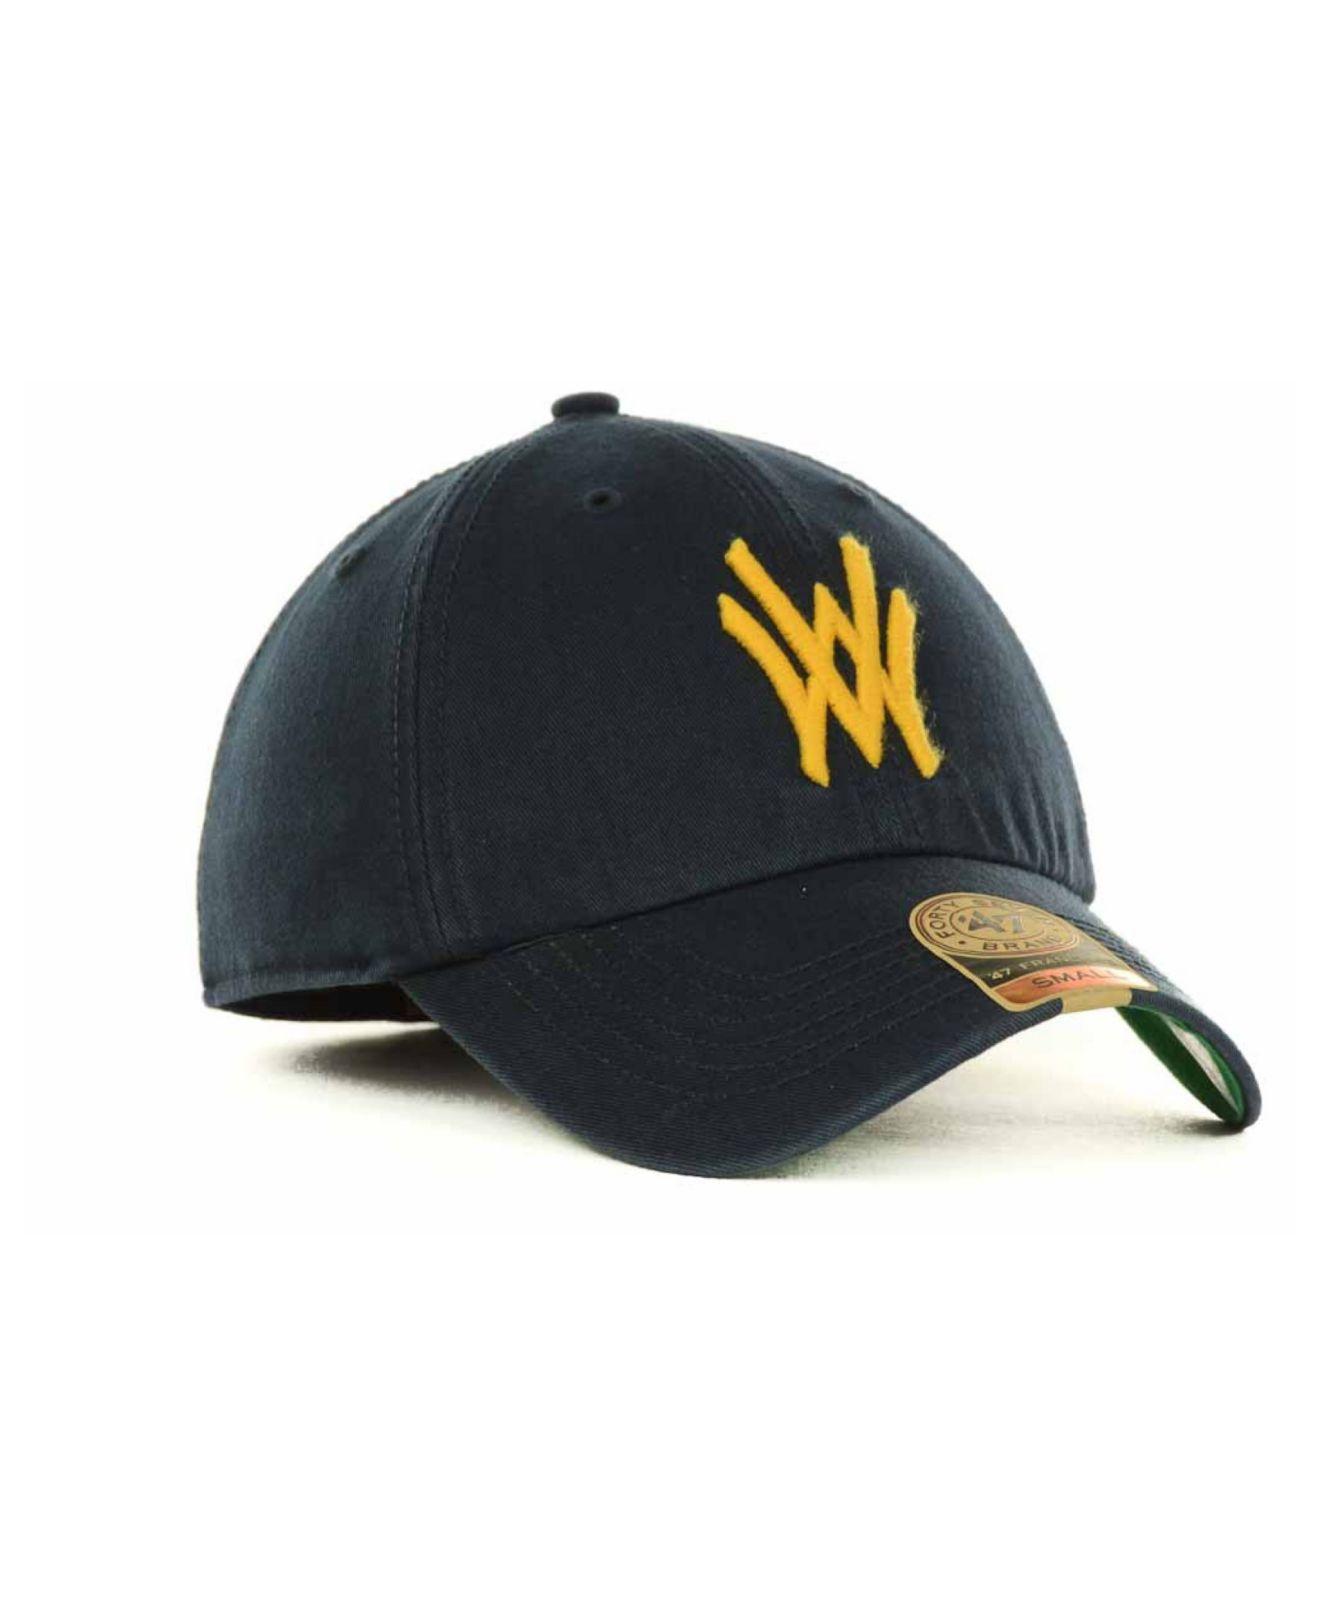 greece virginia baseball cap d7279 fc3f7 430fc74bd8f